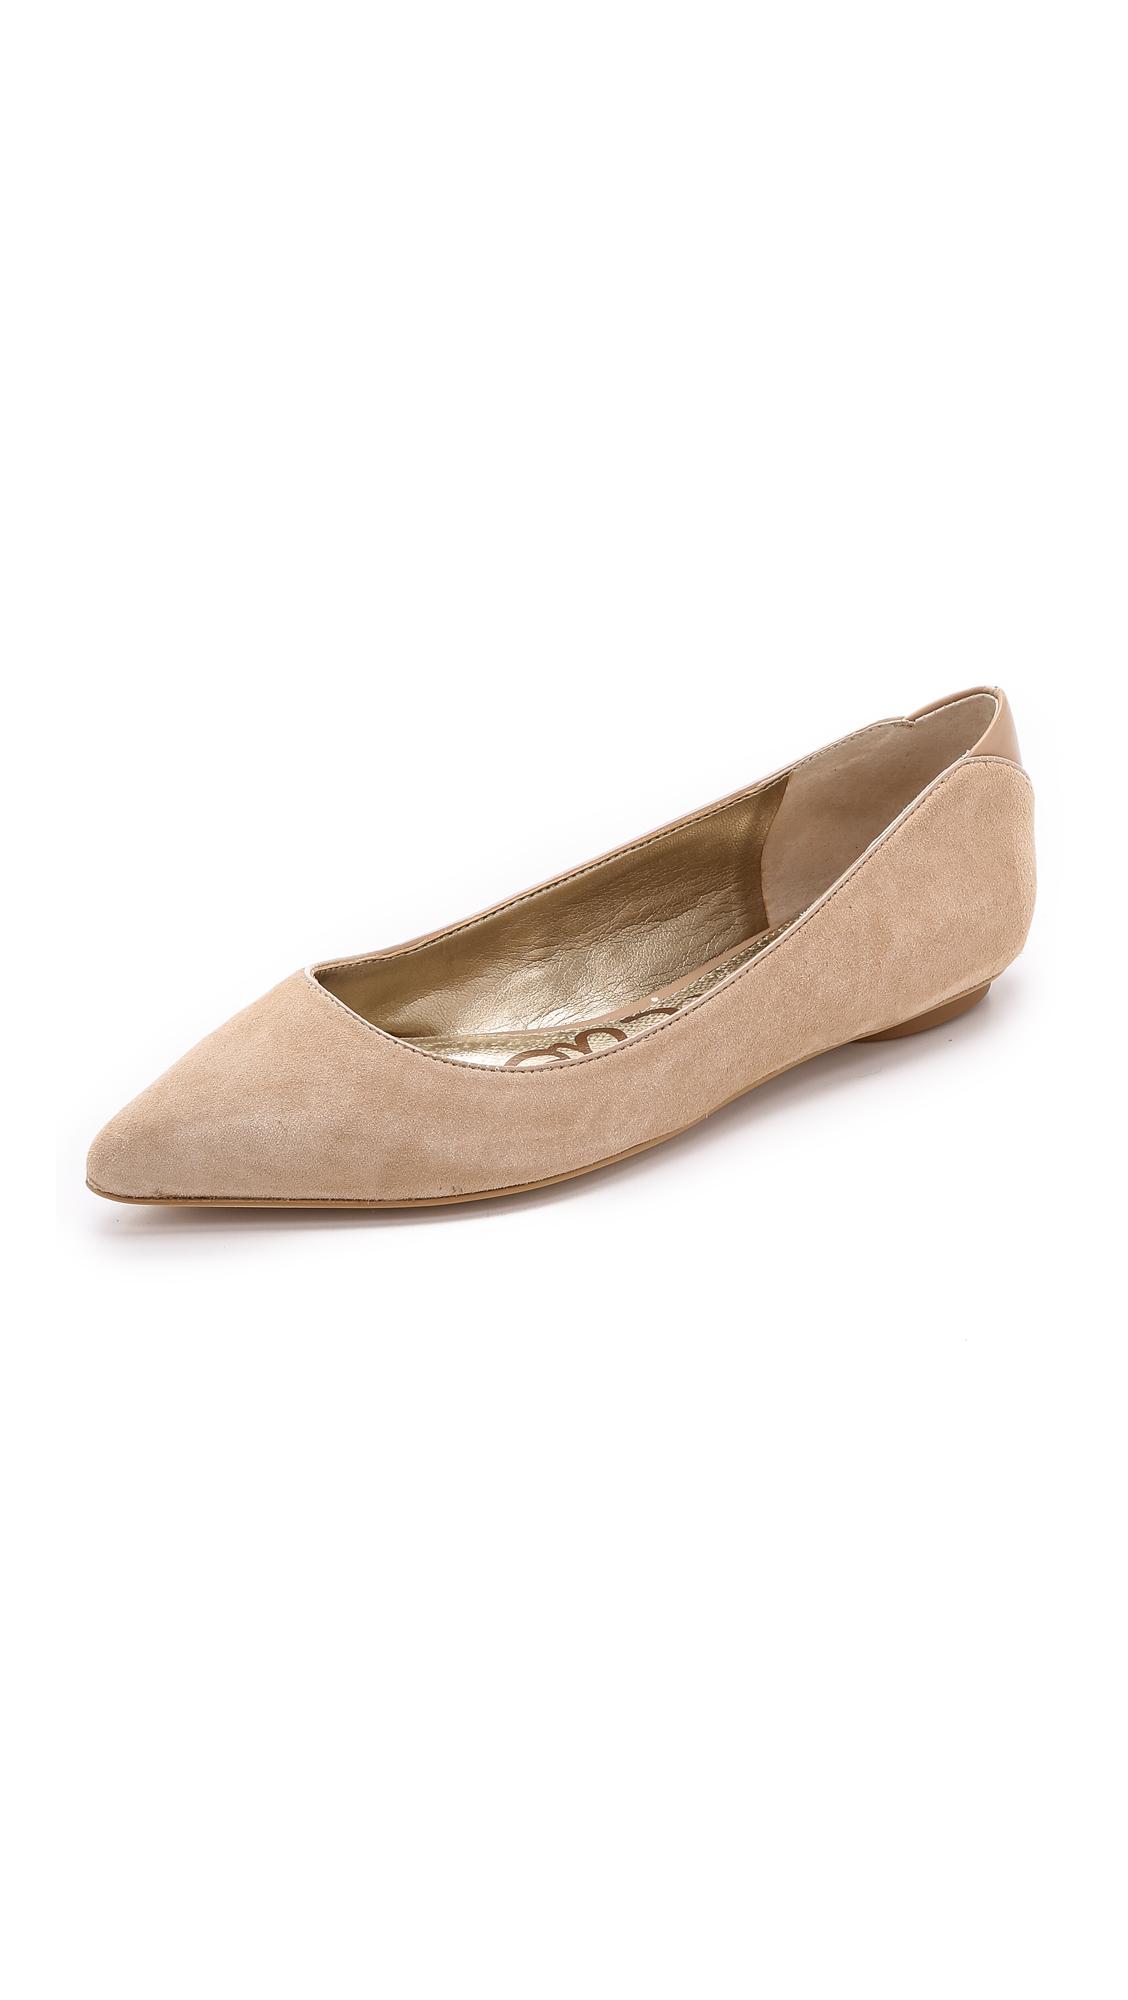 09762a85fd9fbb Sam Edelman Colleen Suede Ballet Flats